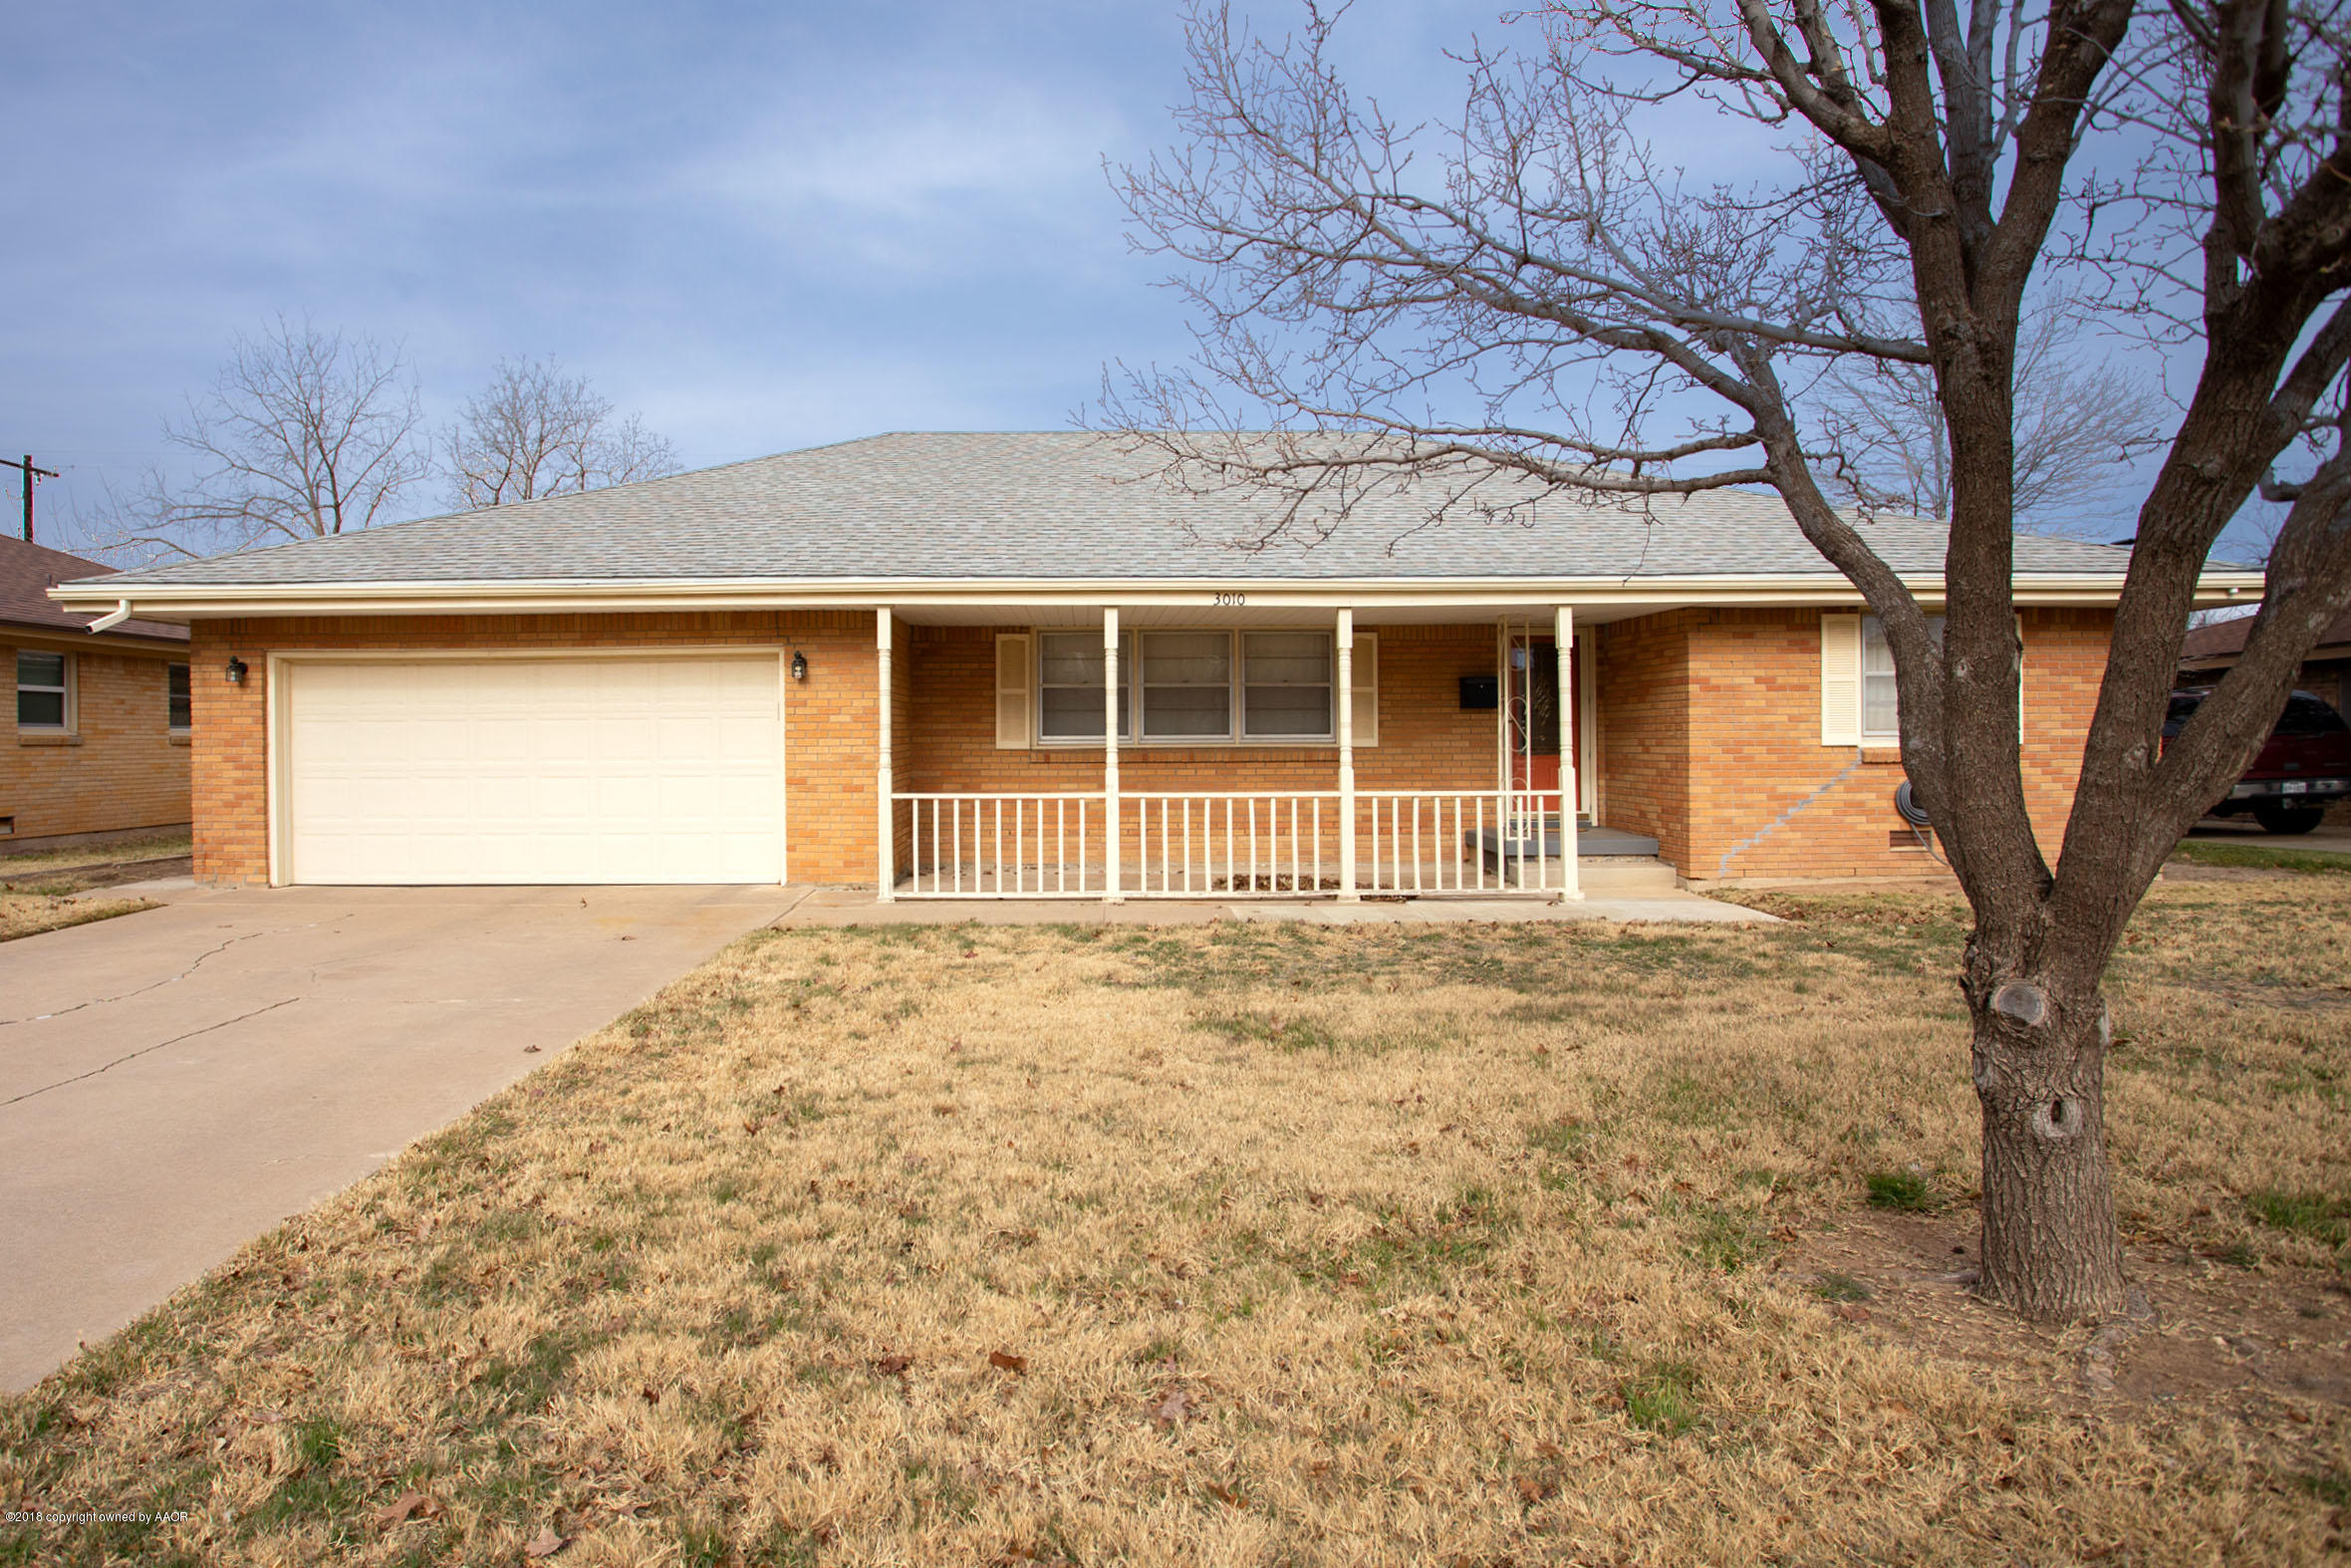 3010 MOCKINGBIRD LN, Amarillo in Randall County, TX 79109 Home for Sale